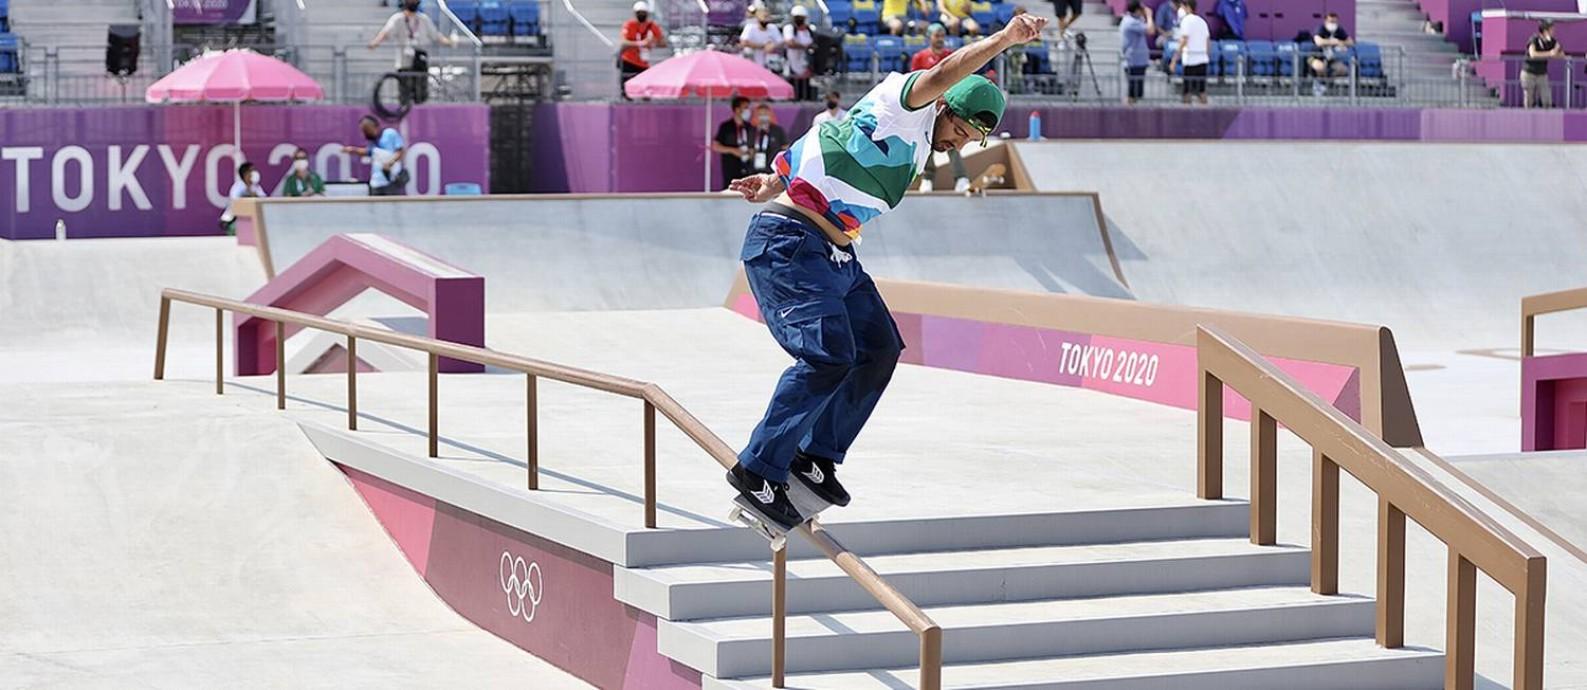 Kelvin durante treino na pista olímpica Foto: CBSk/Julio Detefon